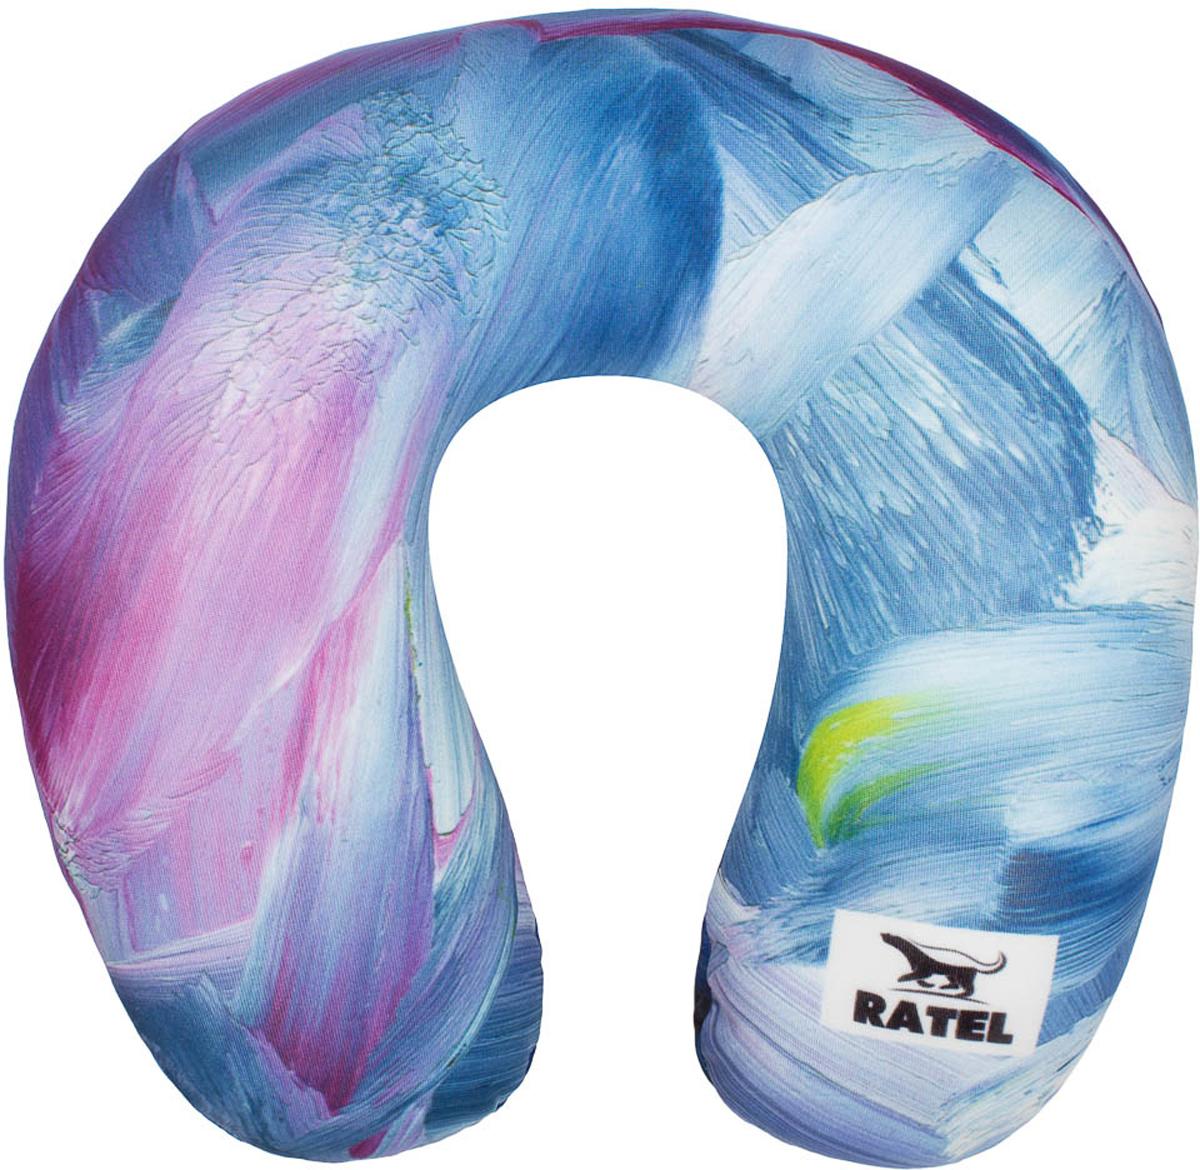 Подушка для путешествий Ratel  Природа  - Подушки